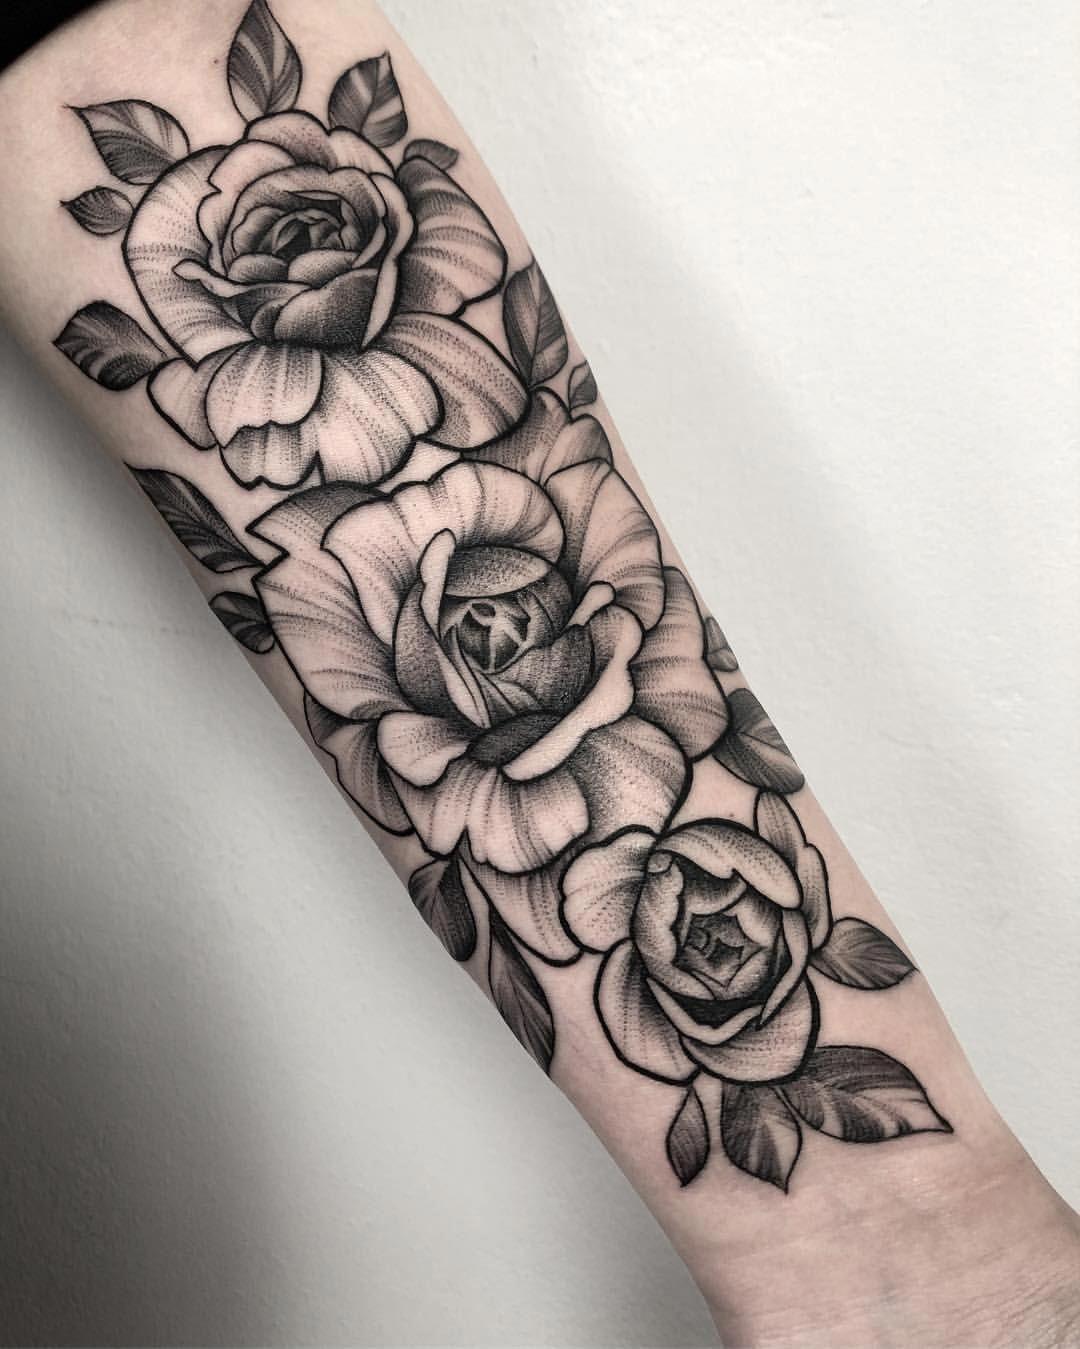 20 Tatuajes de rosas en el antebrazo